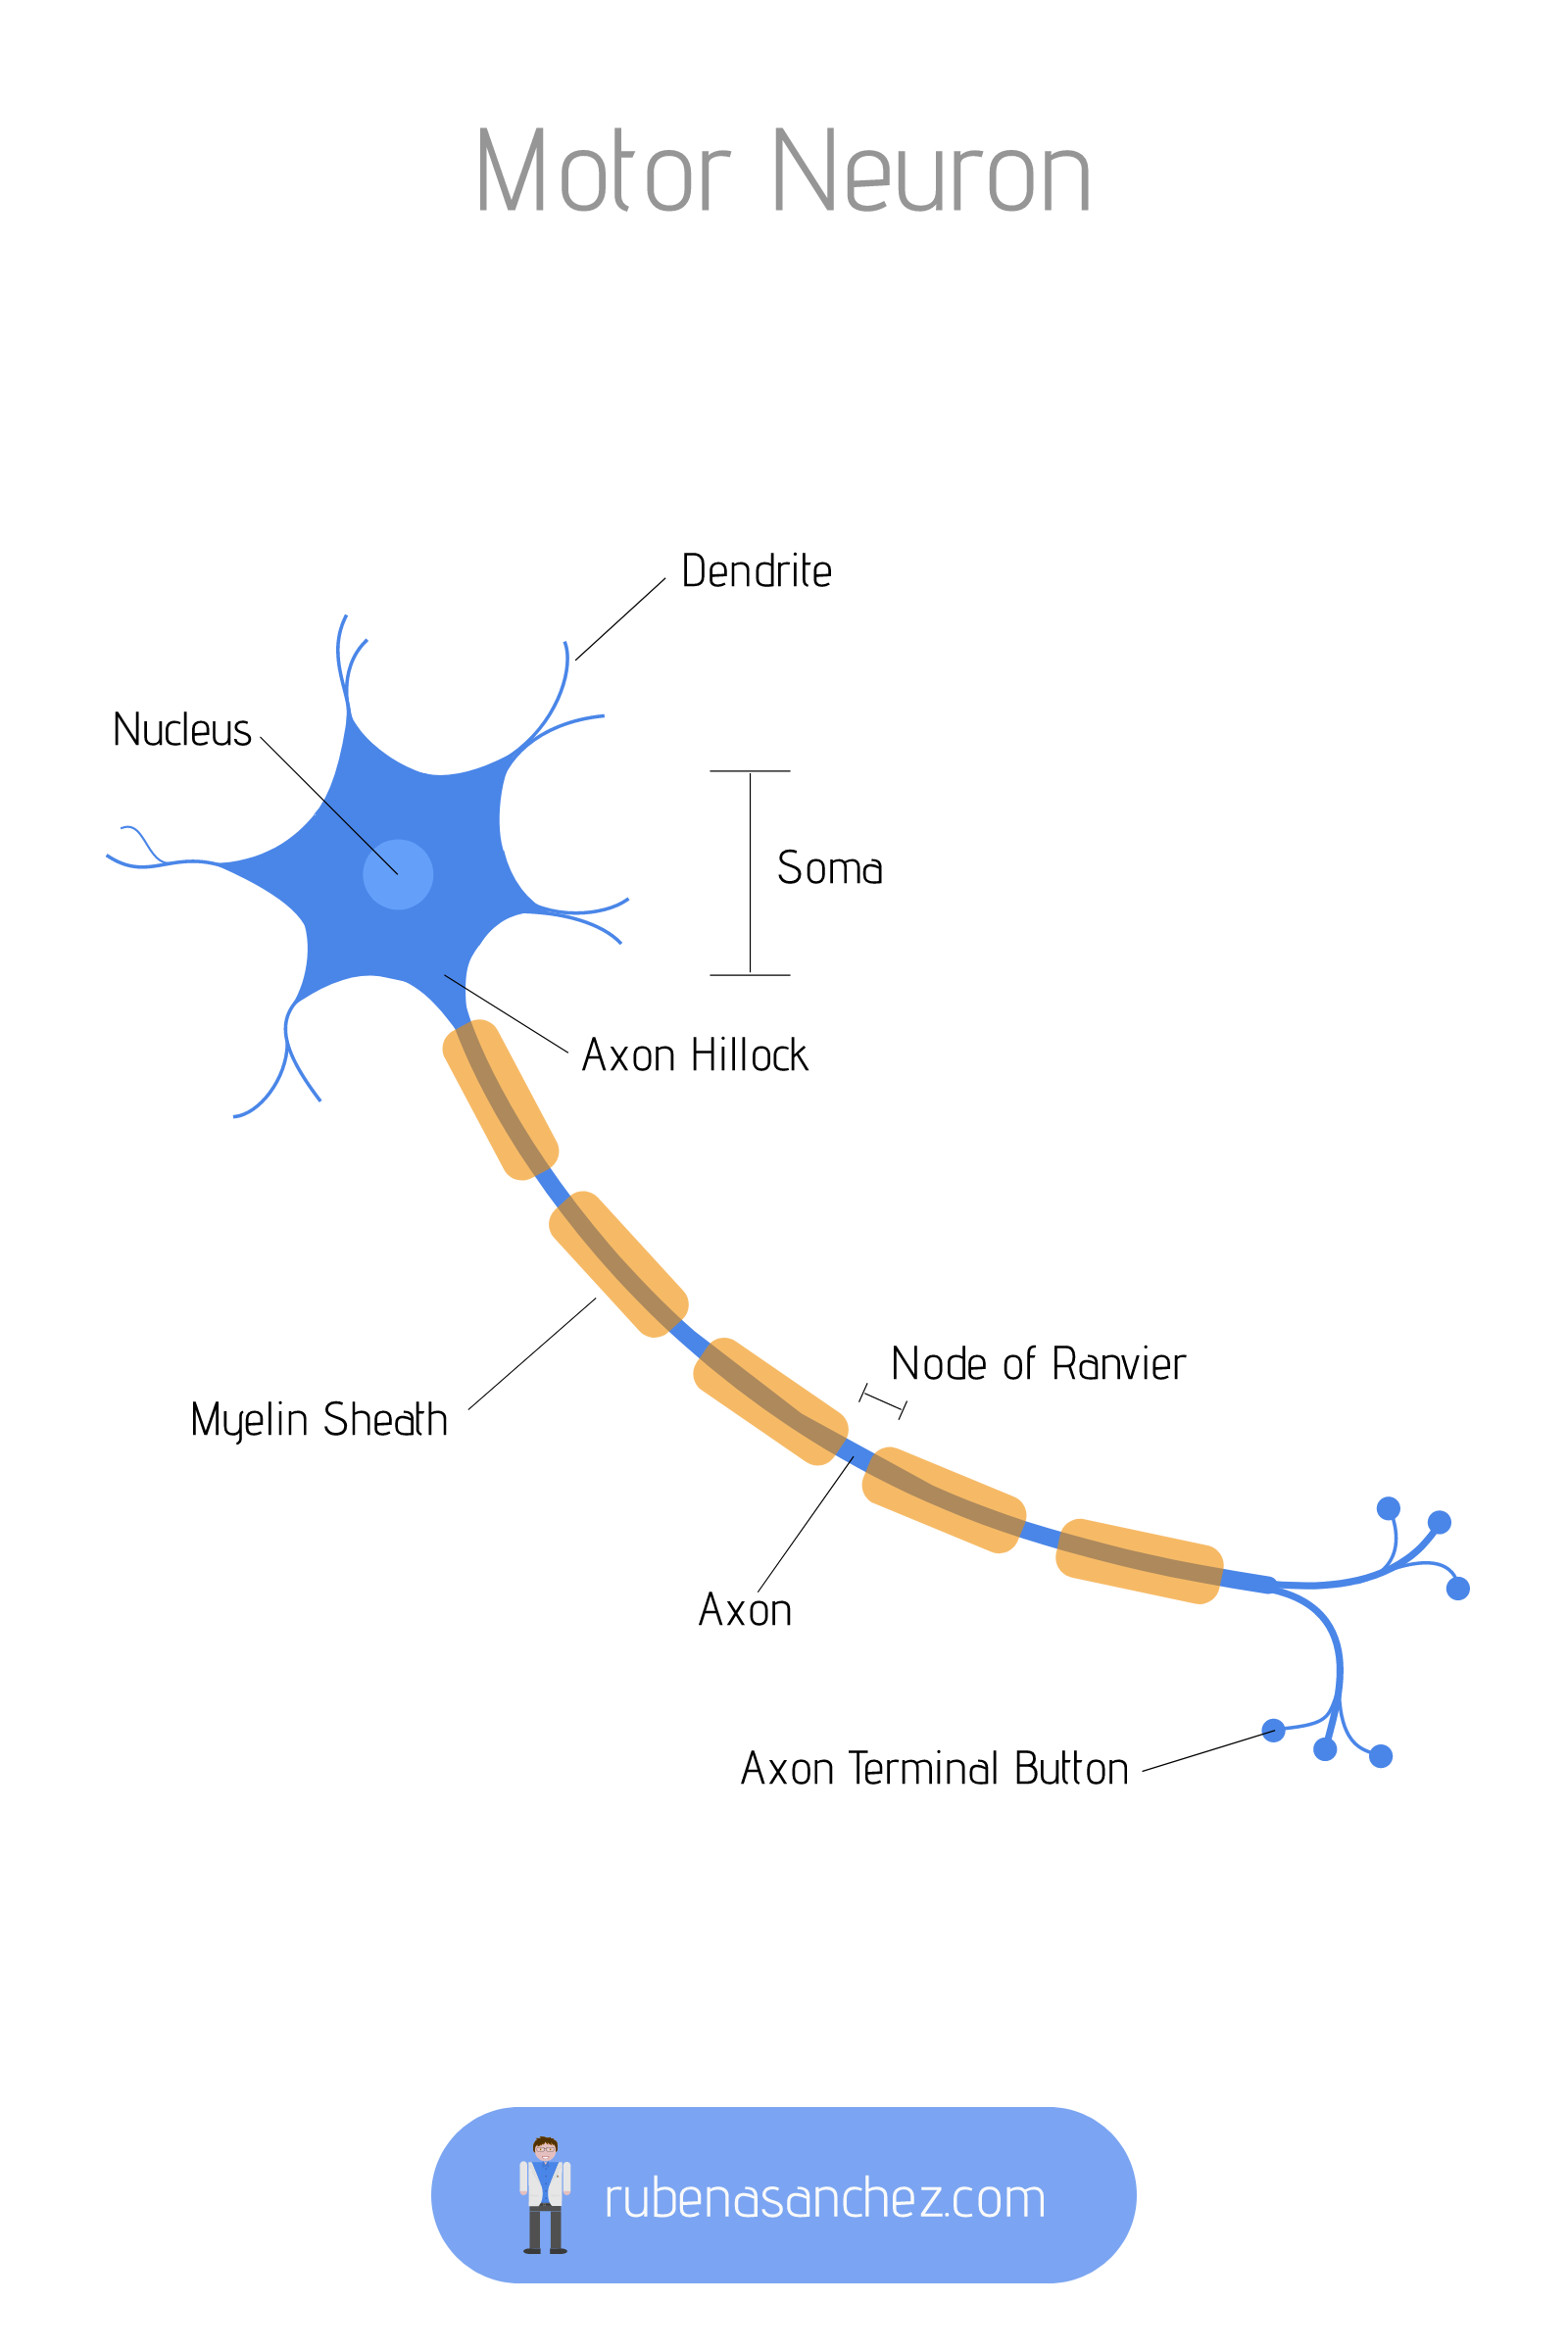 Motor Neuron   Motor neuron, Neurons, Anatomy